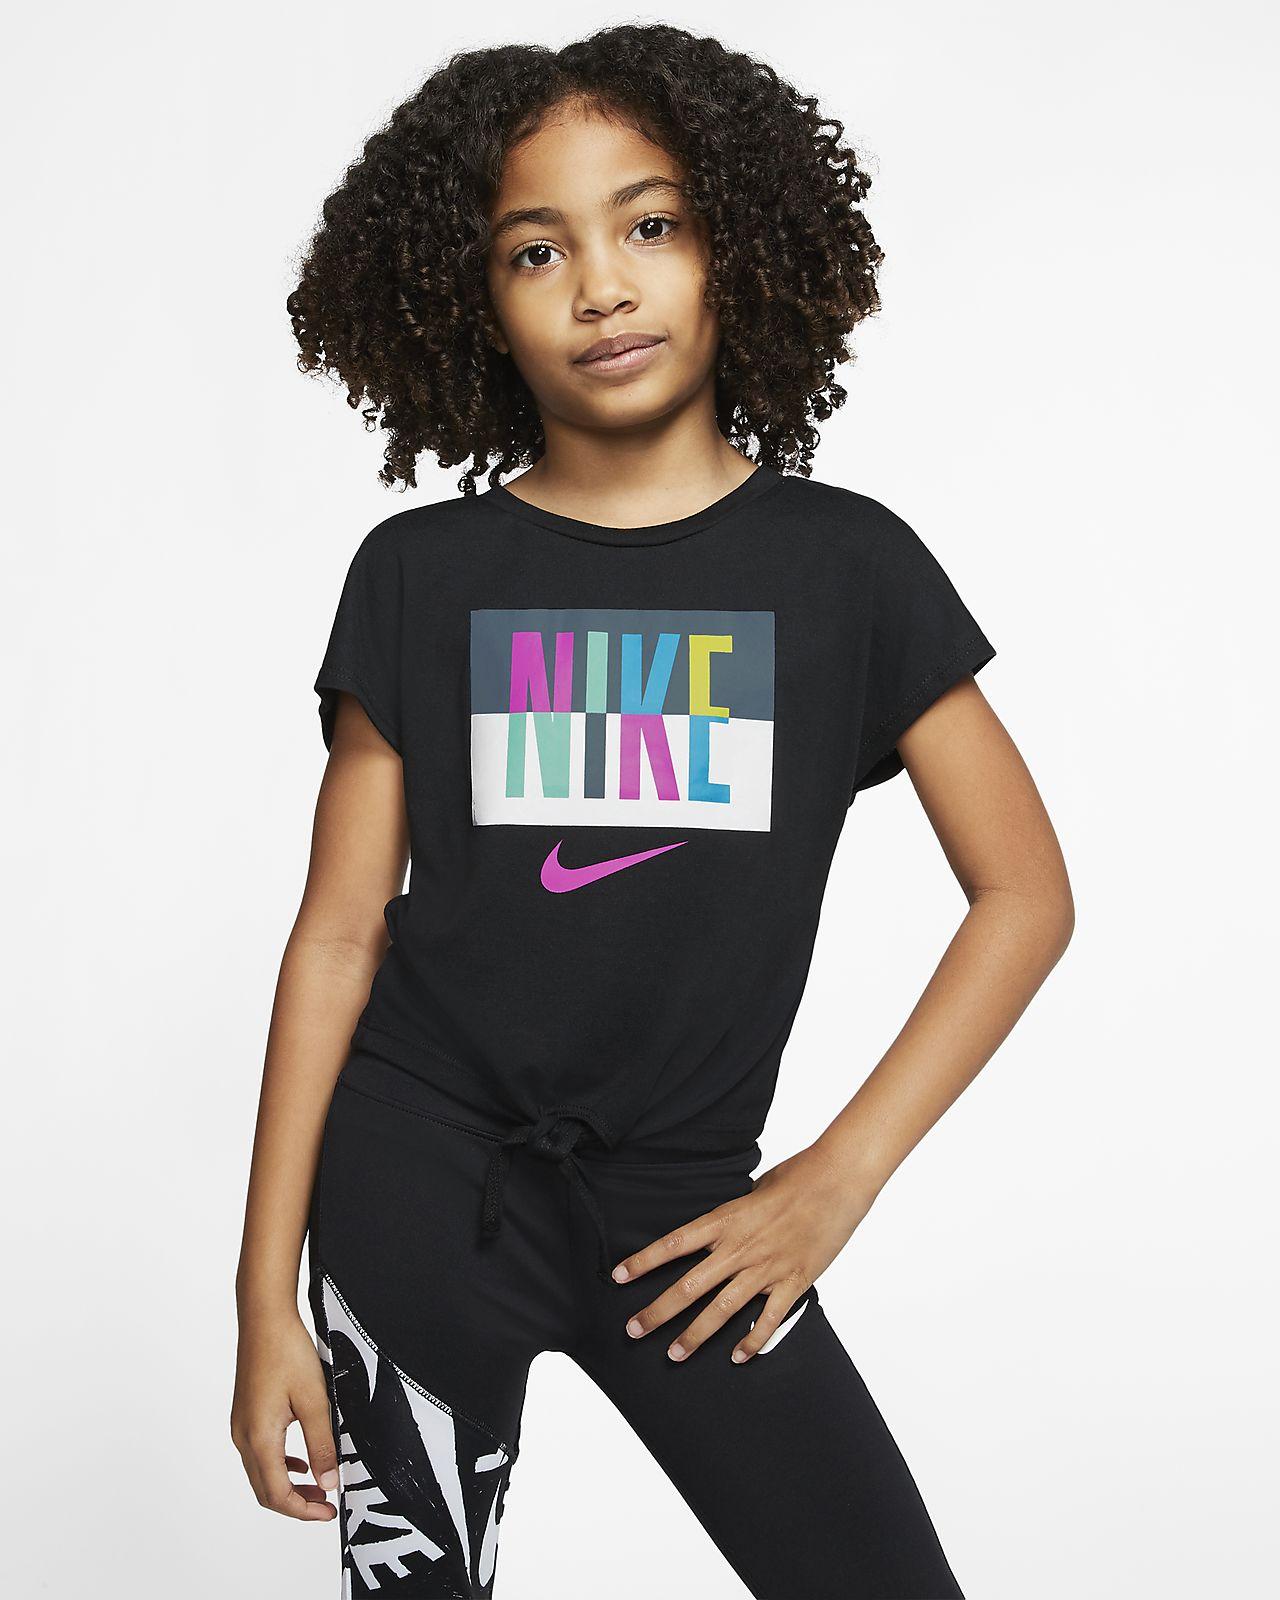 Nike Little Kids' Short-Sleeve Top